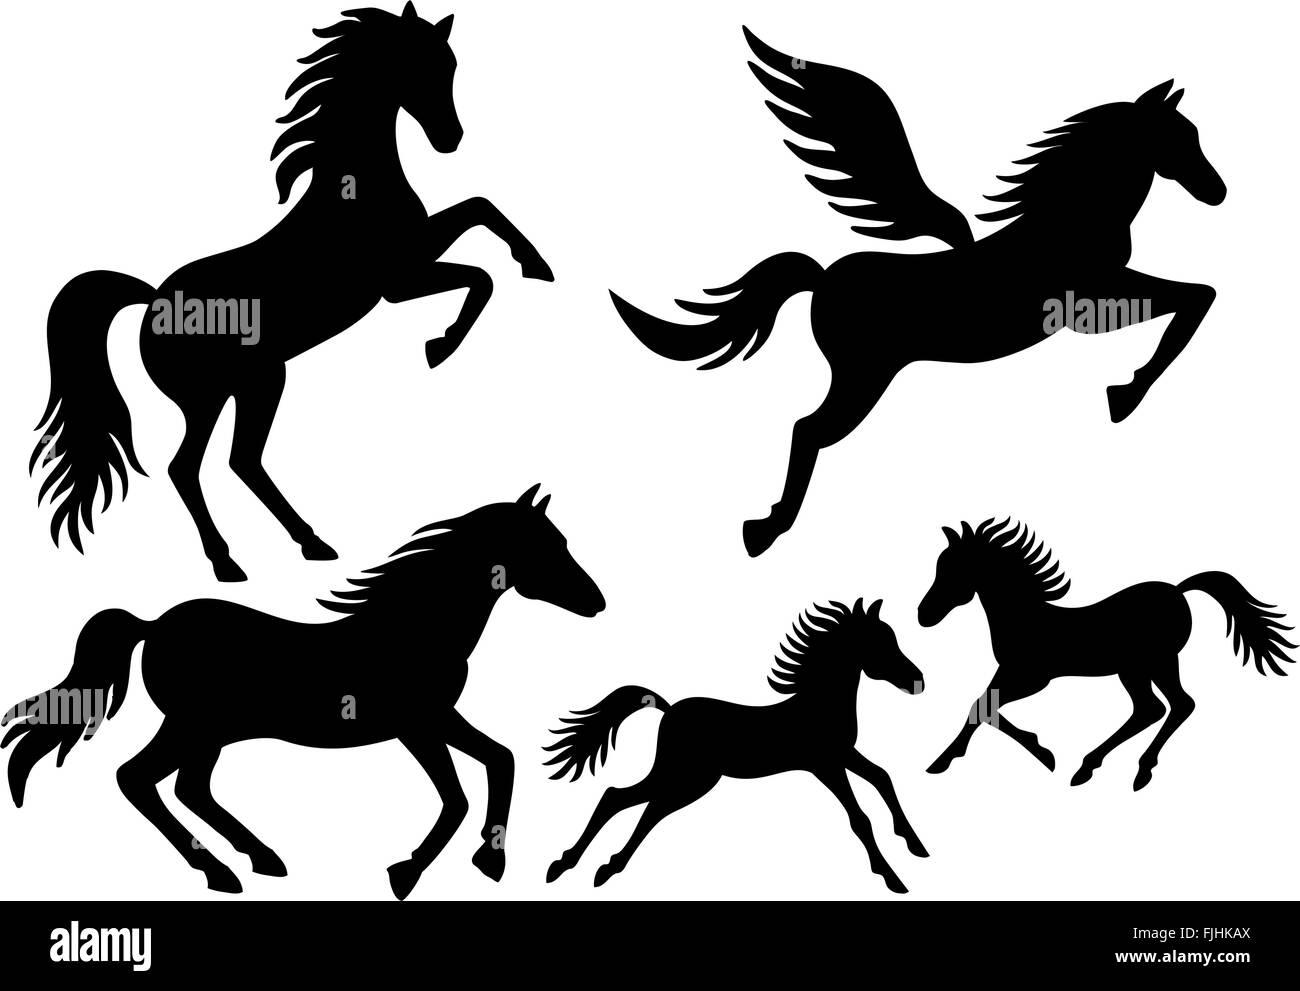 Black horses, running, jumping, flying silhouettes, vector set - Stock Image